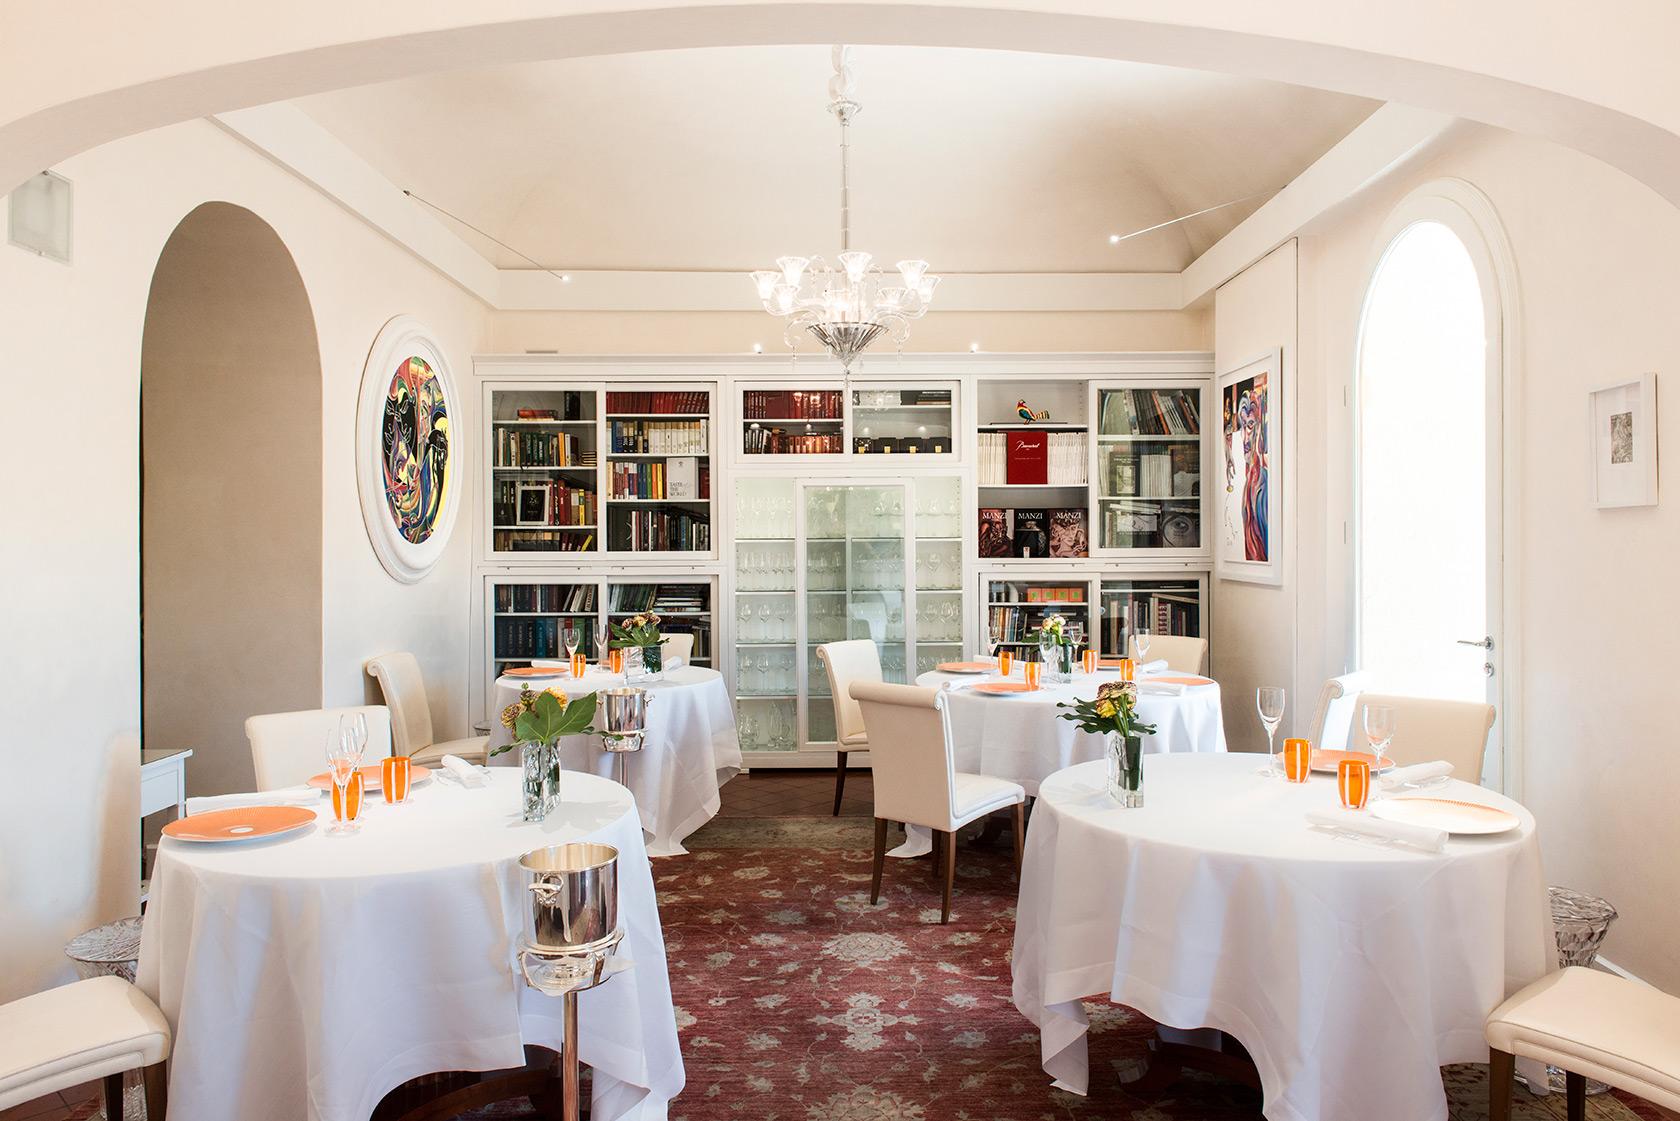 arnolfo-ristornate-sala-grande-colle-val-delsa